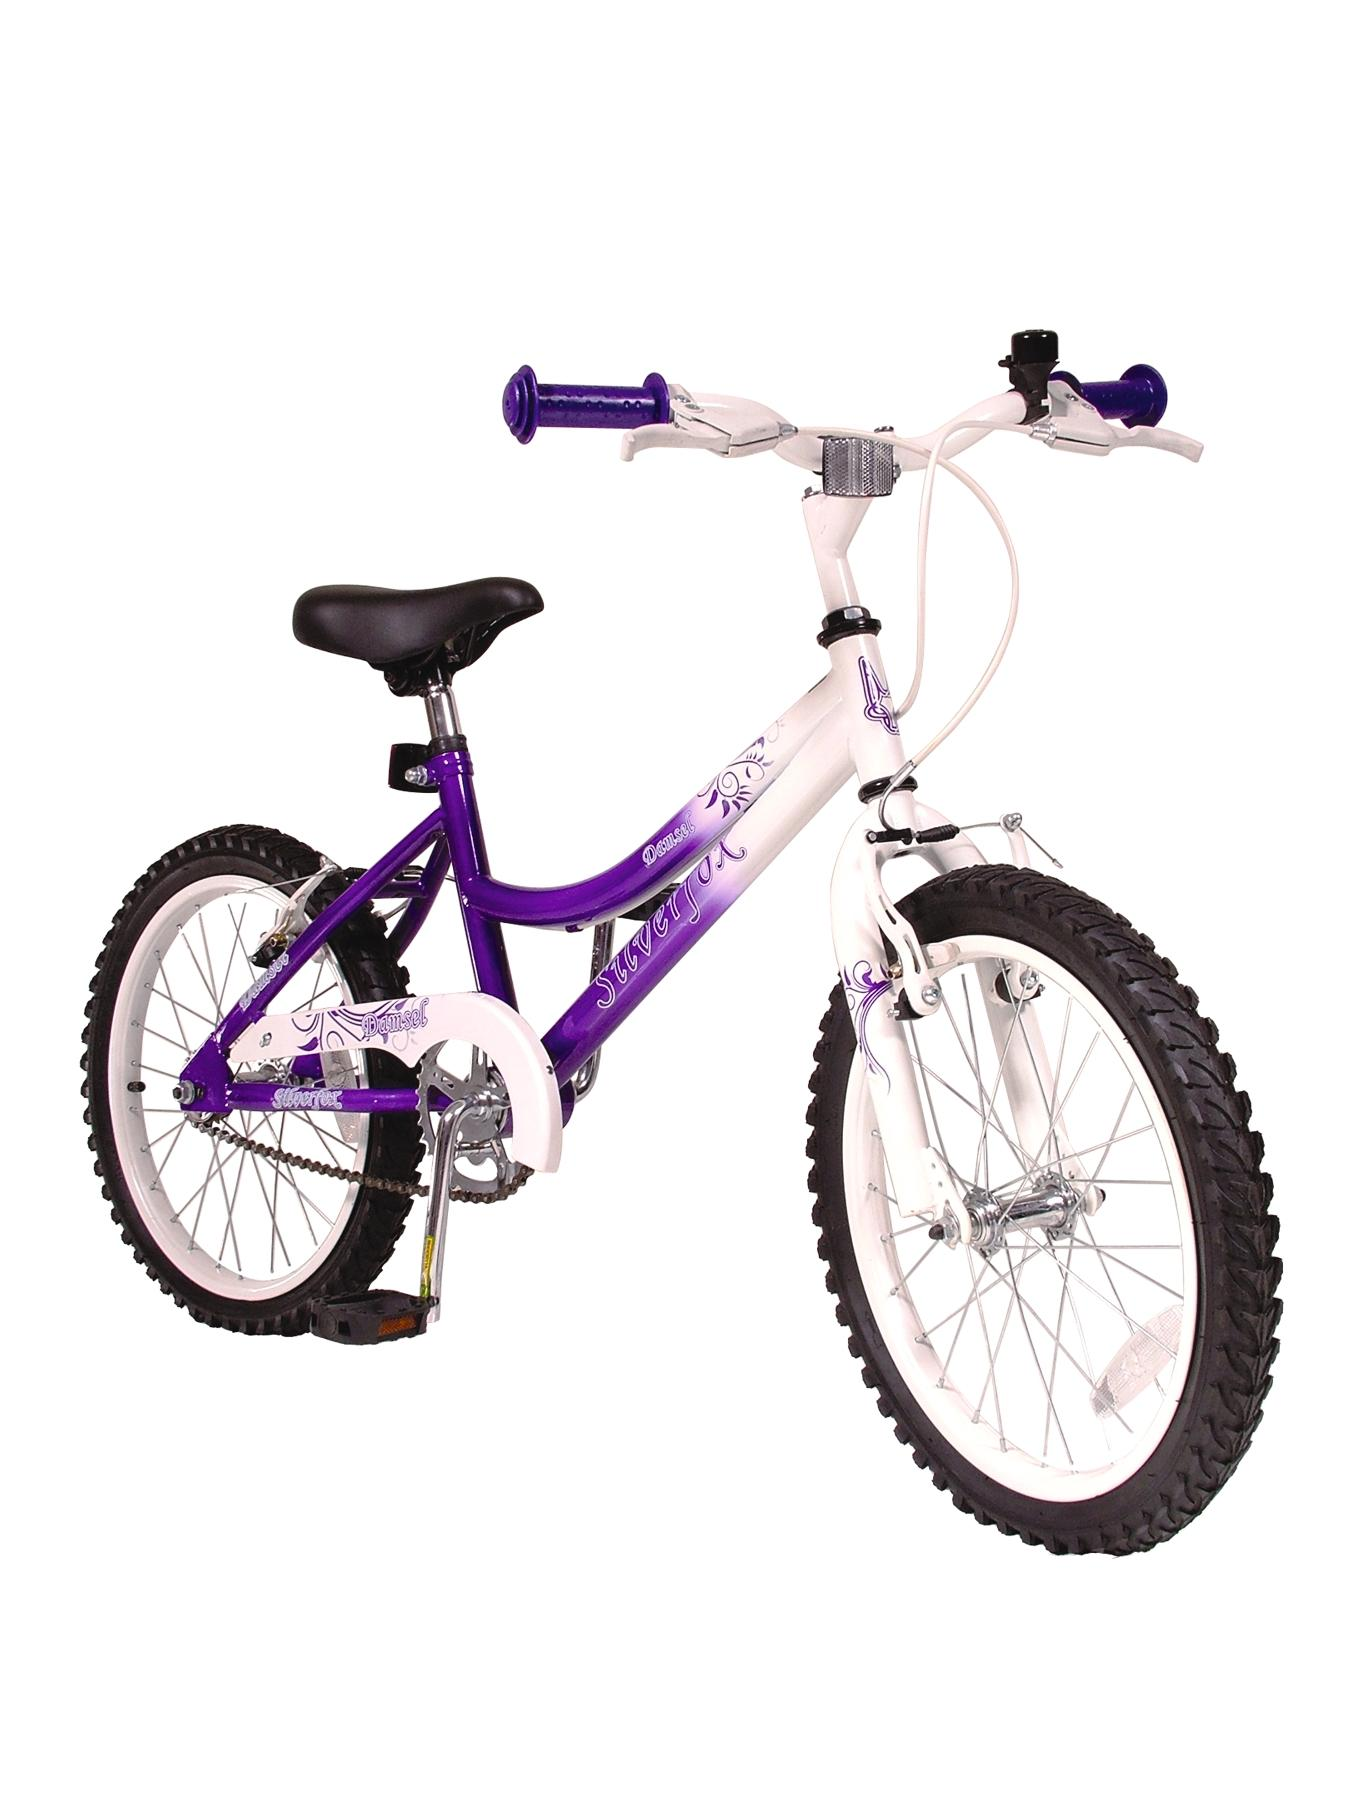 18 Inch Girls Bike Bing Images